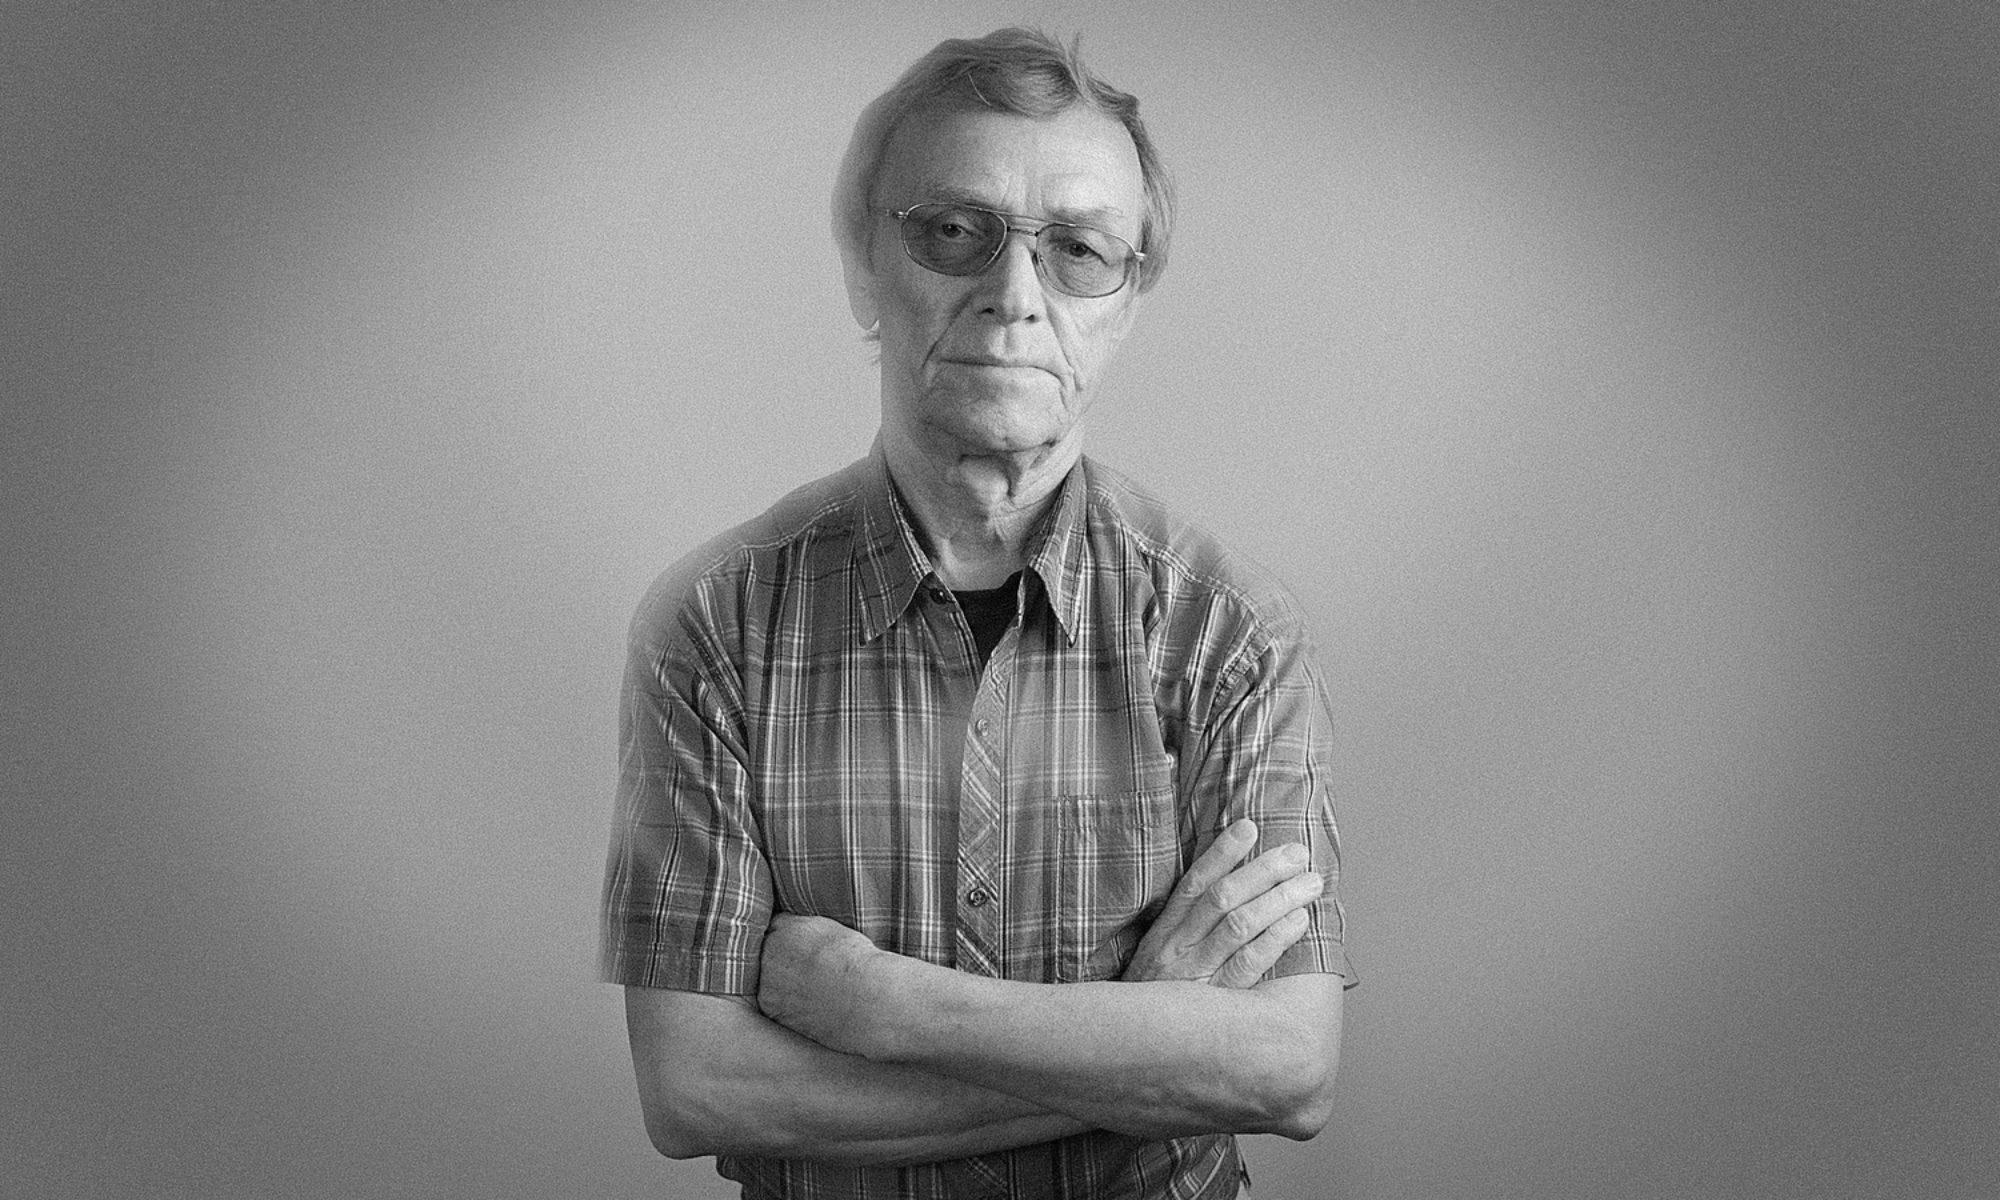 Кинорежиссер Анатолий Балуев